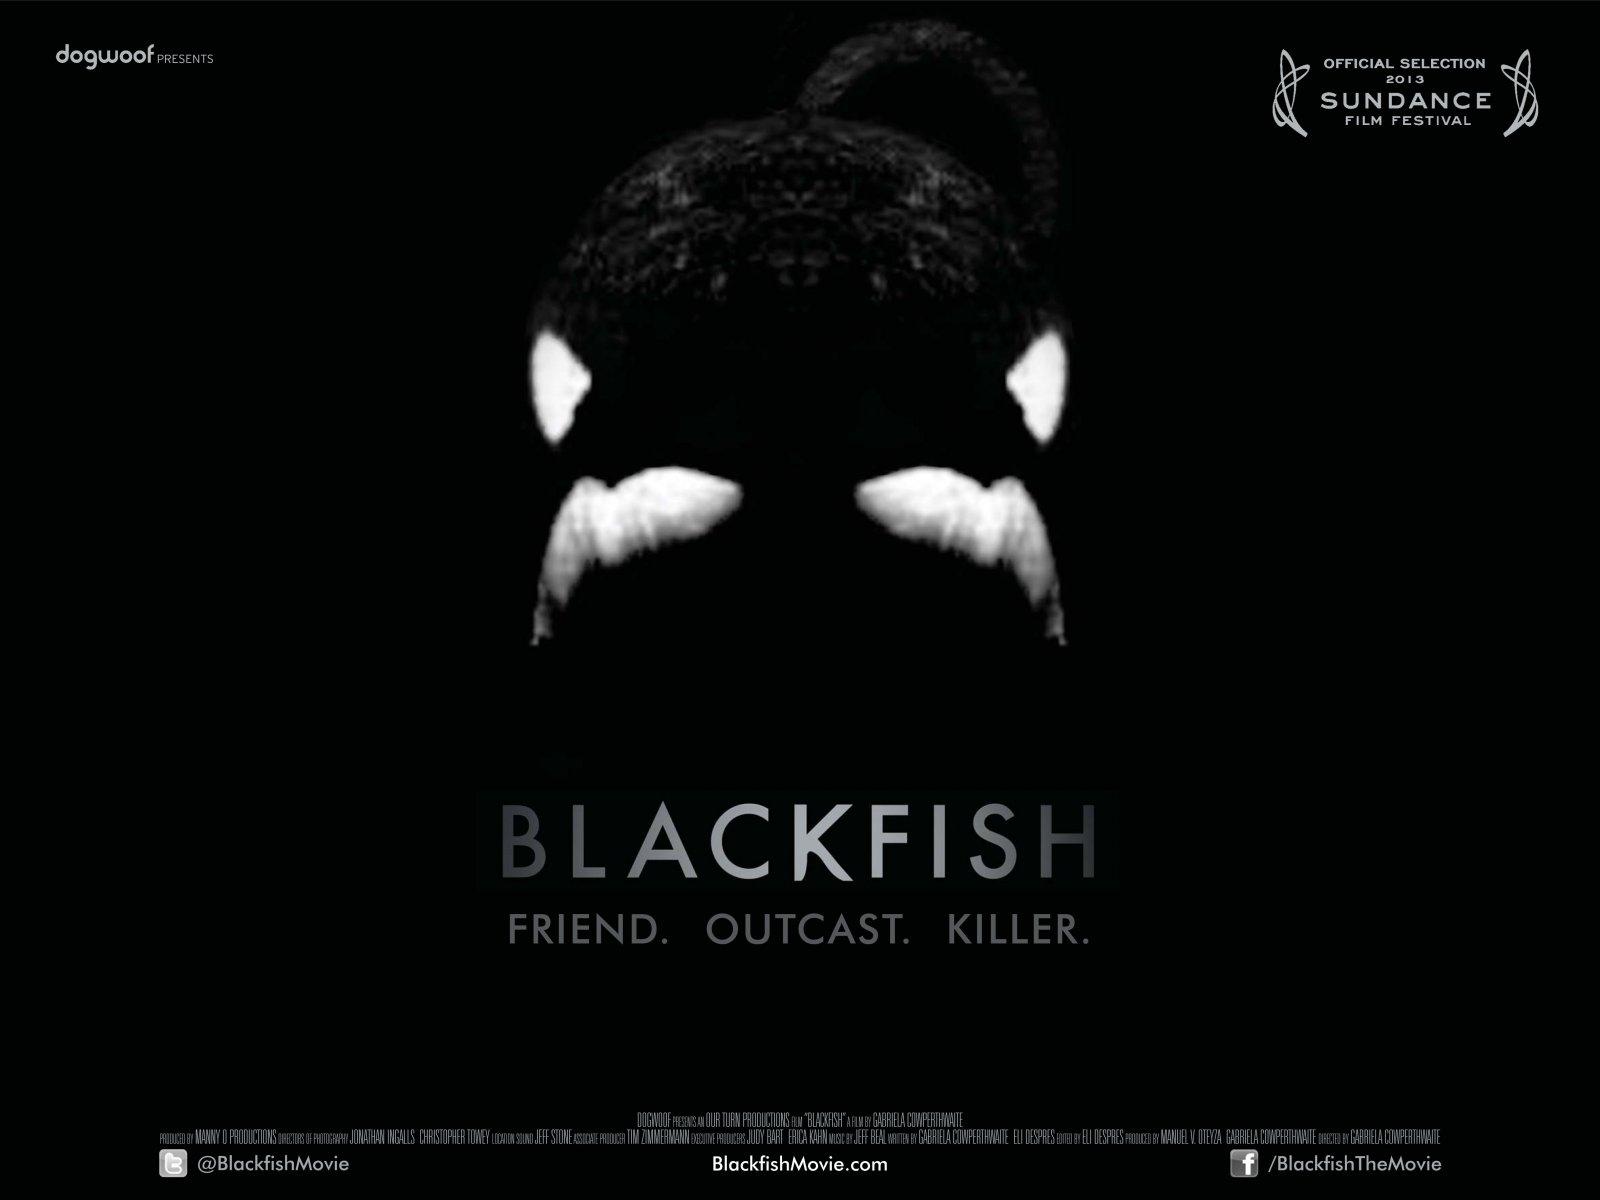 Dogwoof_Documentary_Blackfish_Quad_New_1600_1200_85.jpg